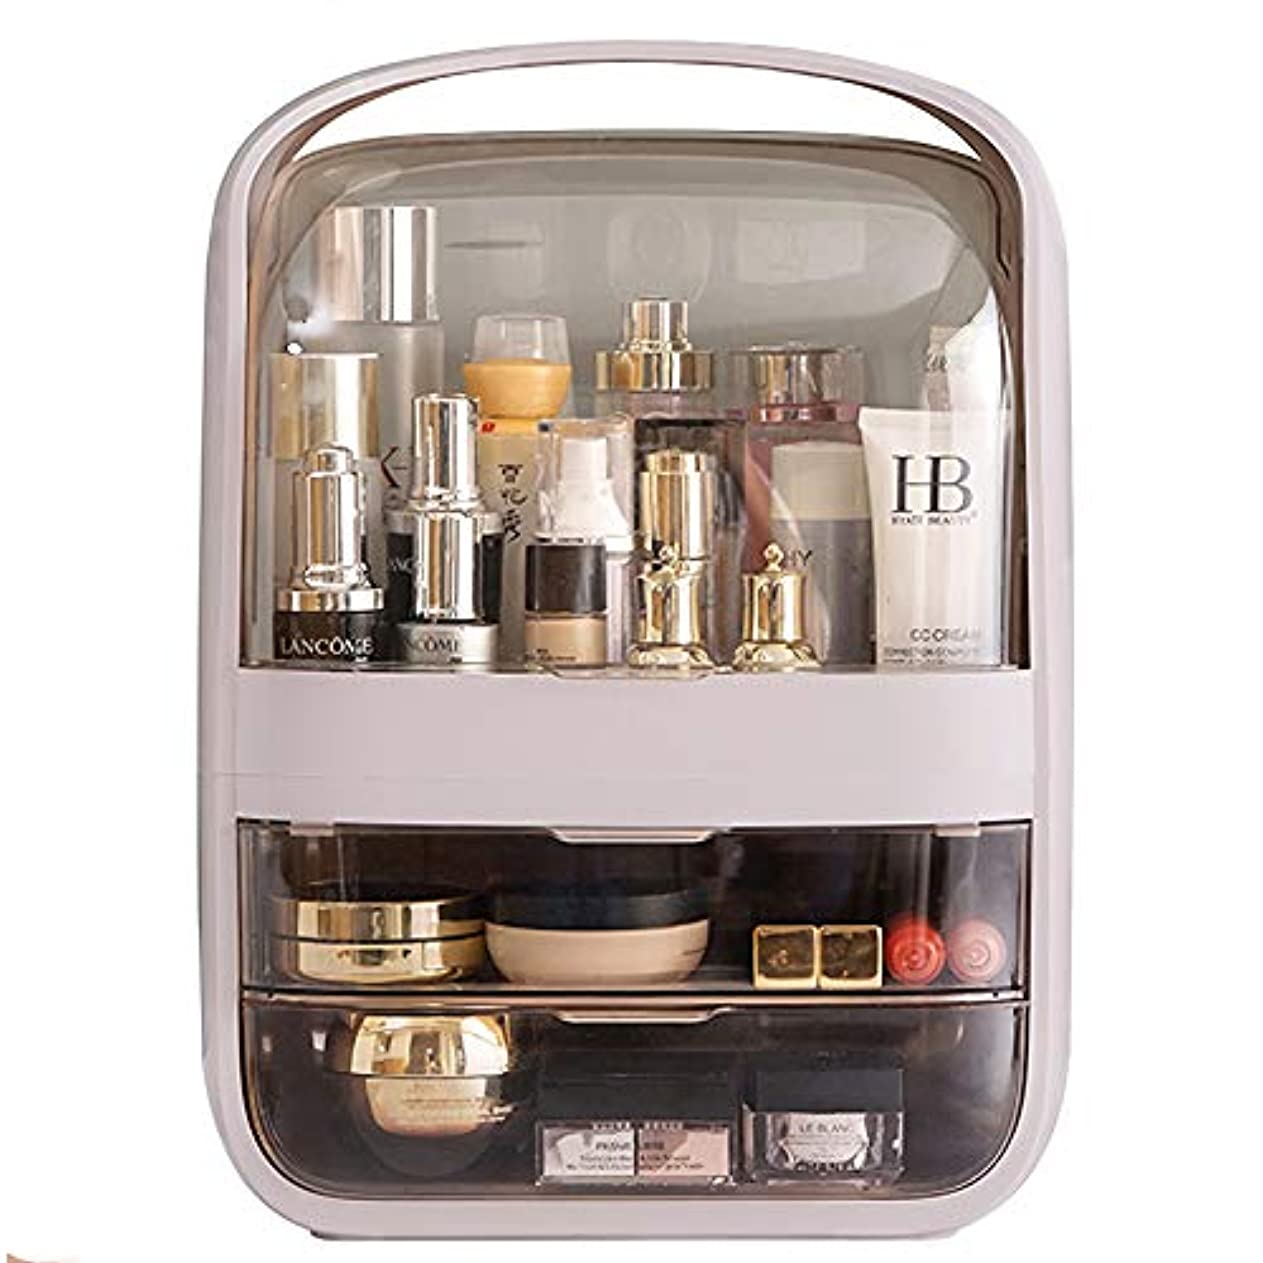 MAGIC UNION メイクボックス 化粧品収納ボックス 防塵 防水 大容量 ックス メイクケース 持ち運び 化粧箱 卓上収納 寝室 浴室 洗面所 家庭用